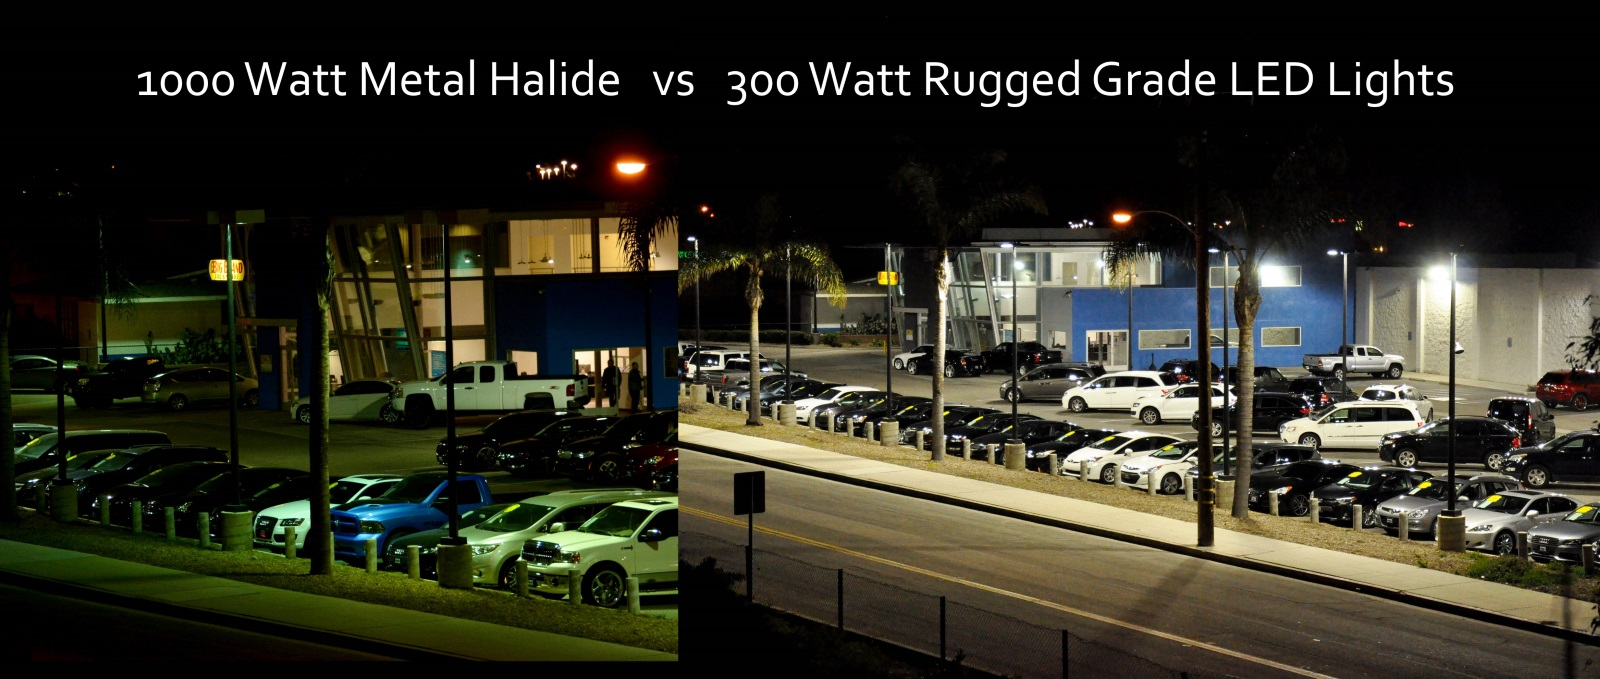 1000 Watt Metal Halide Led Replacement replacing 1000 watt metal halides